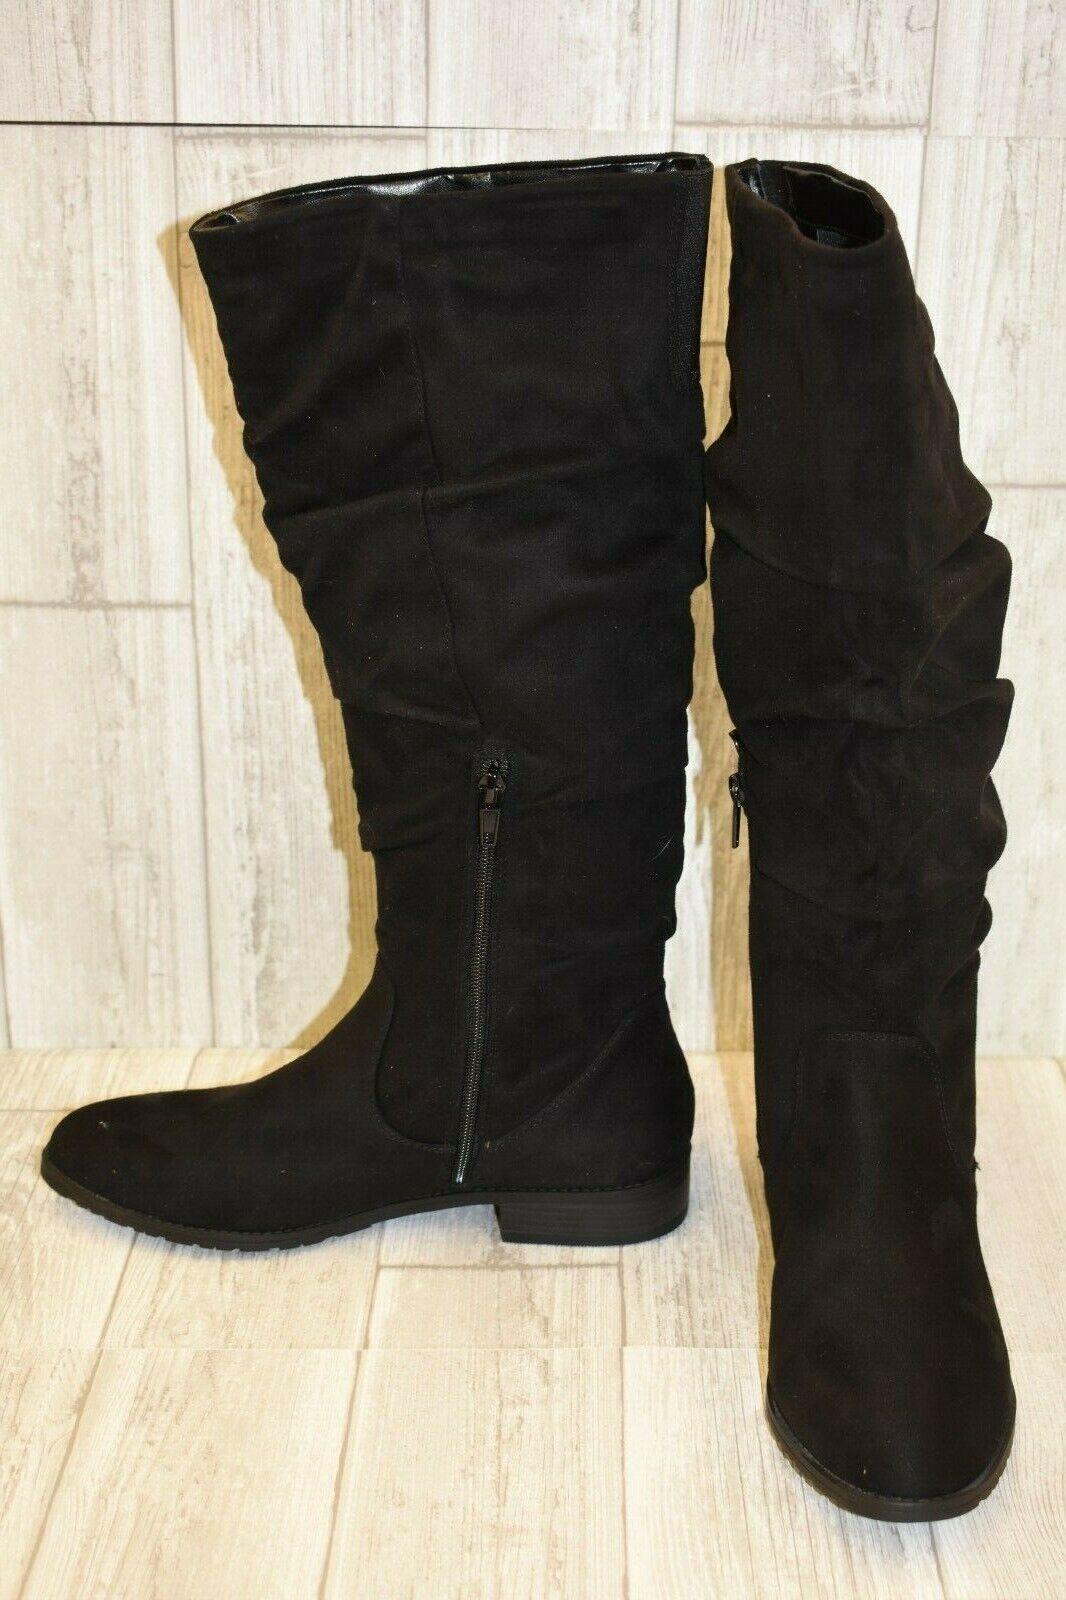 Unisa Sola Tall Boots - Women's Size 9 9.5 M - Black